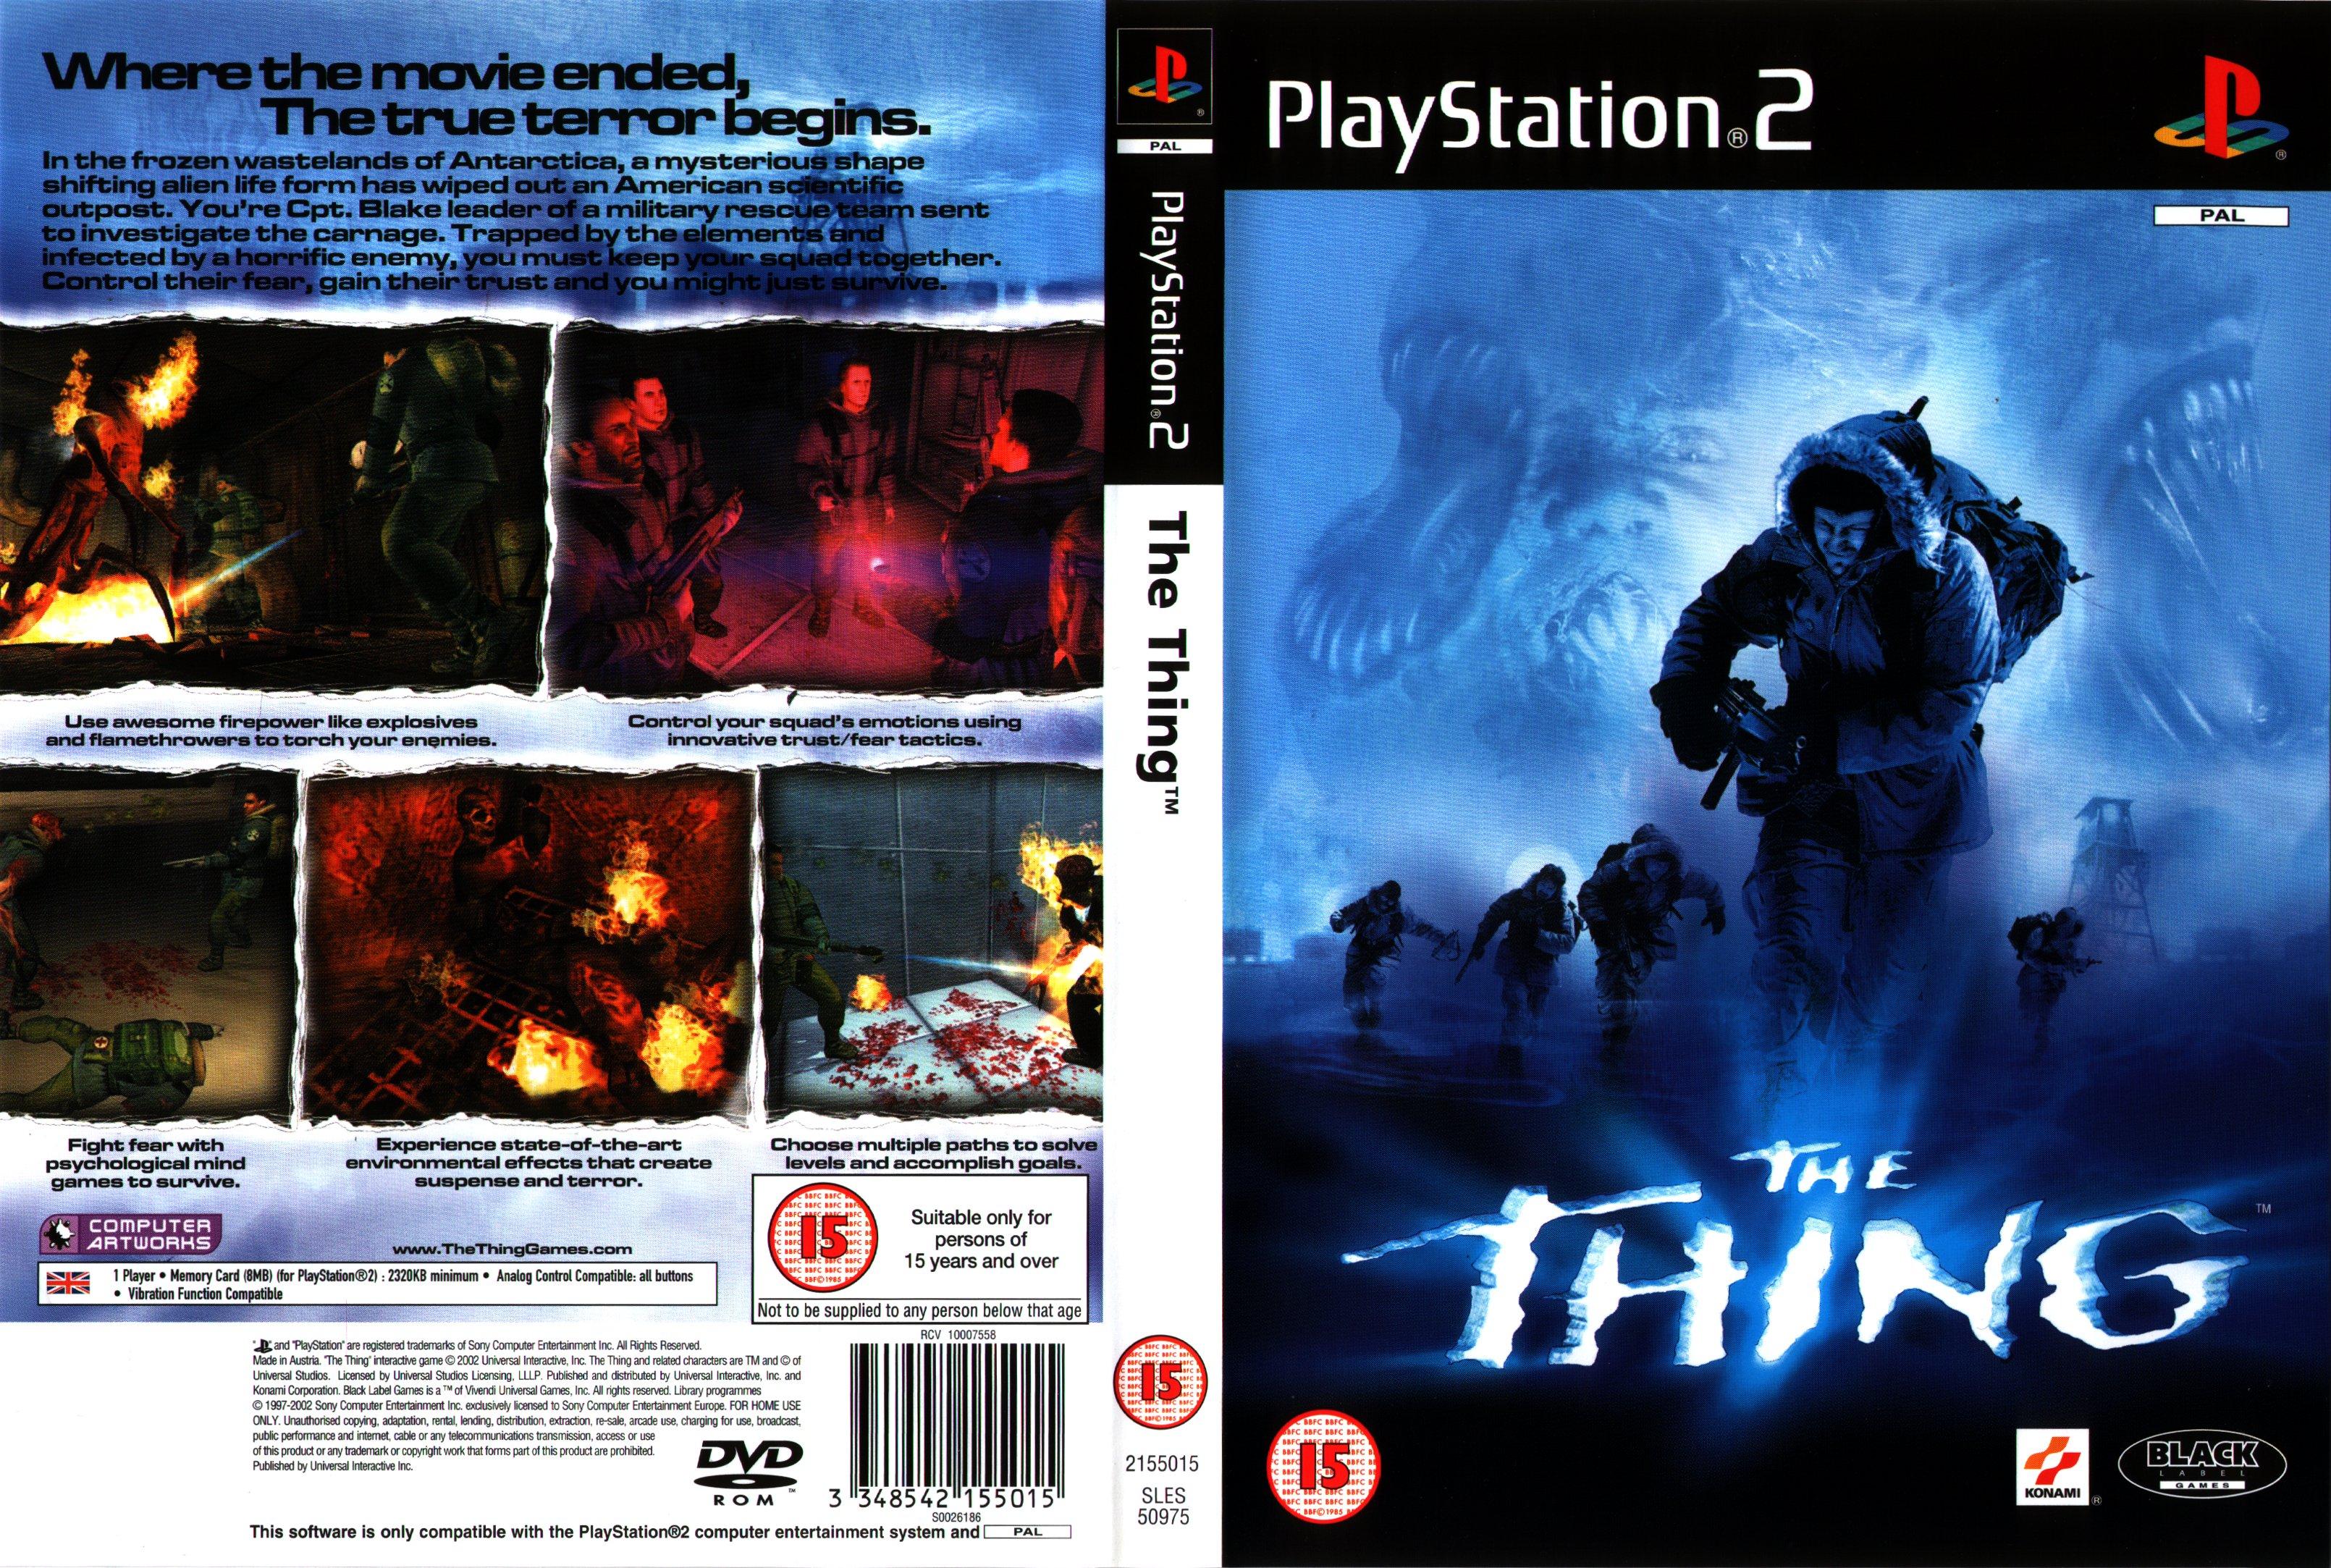 TheThingEvent2002Q3No1